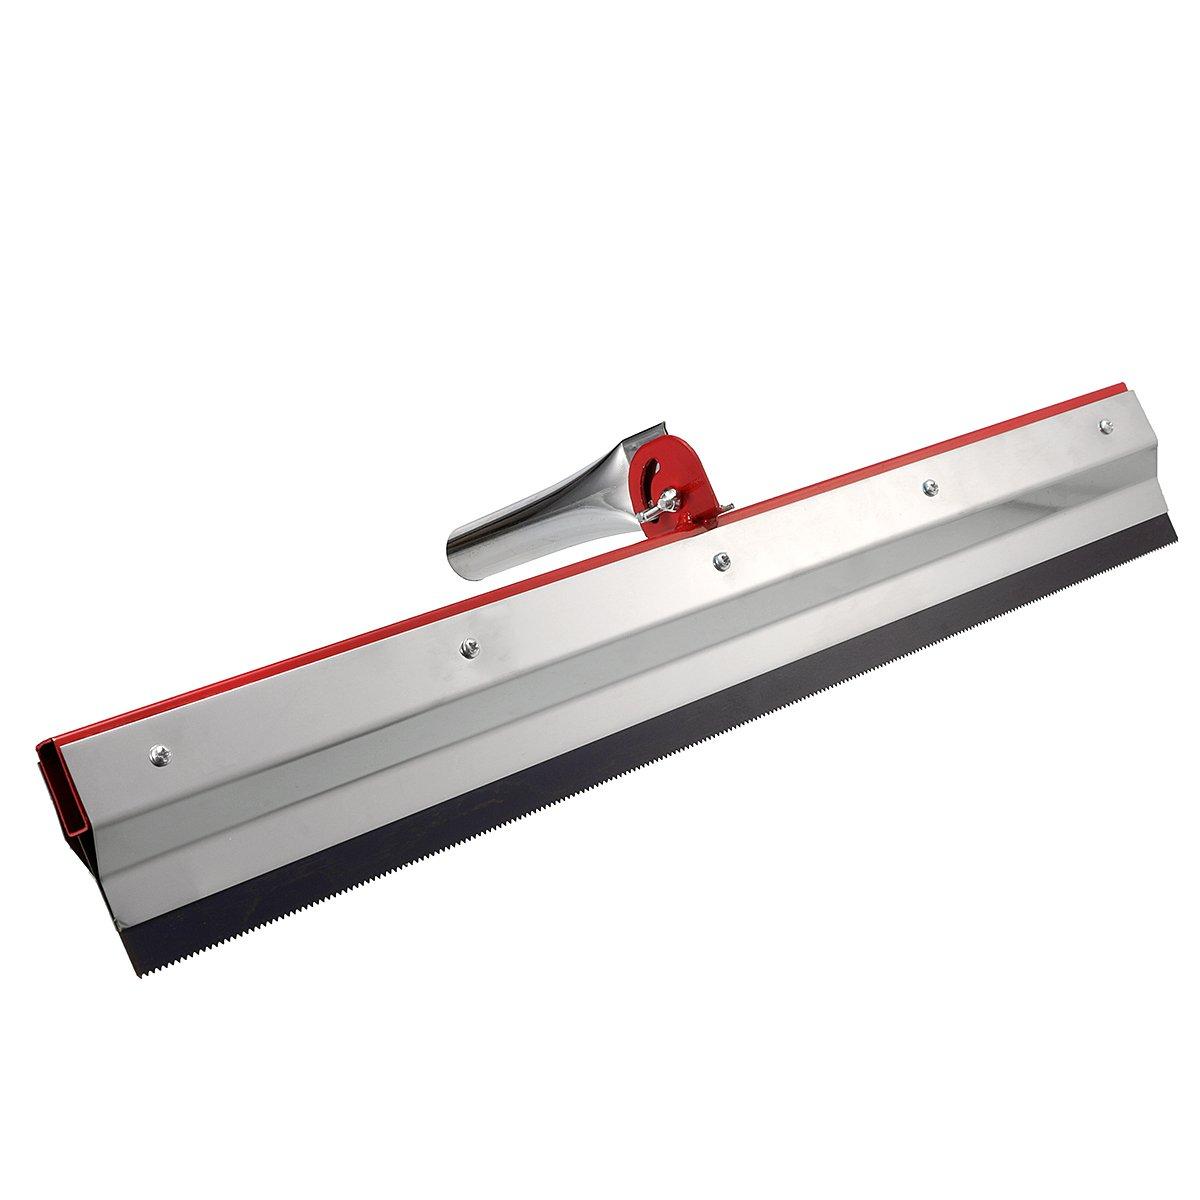 KUNSE Recortados De La Escobilla De Goma Cemento Pintura Epoxi Autonivelante Pavimentos Engranaje Rastrillo 2 3 5Mm Kit De Herramientas-2Mm